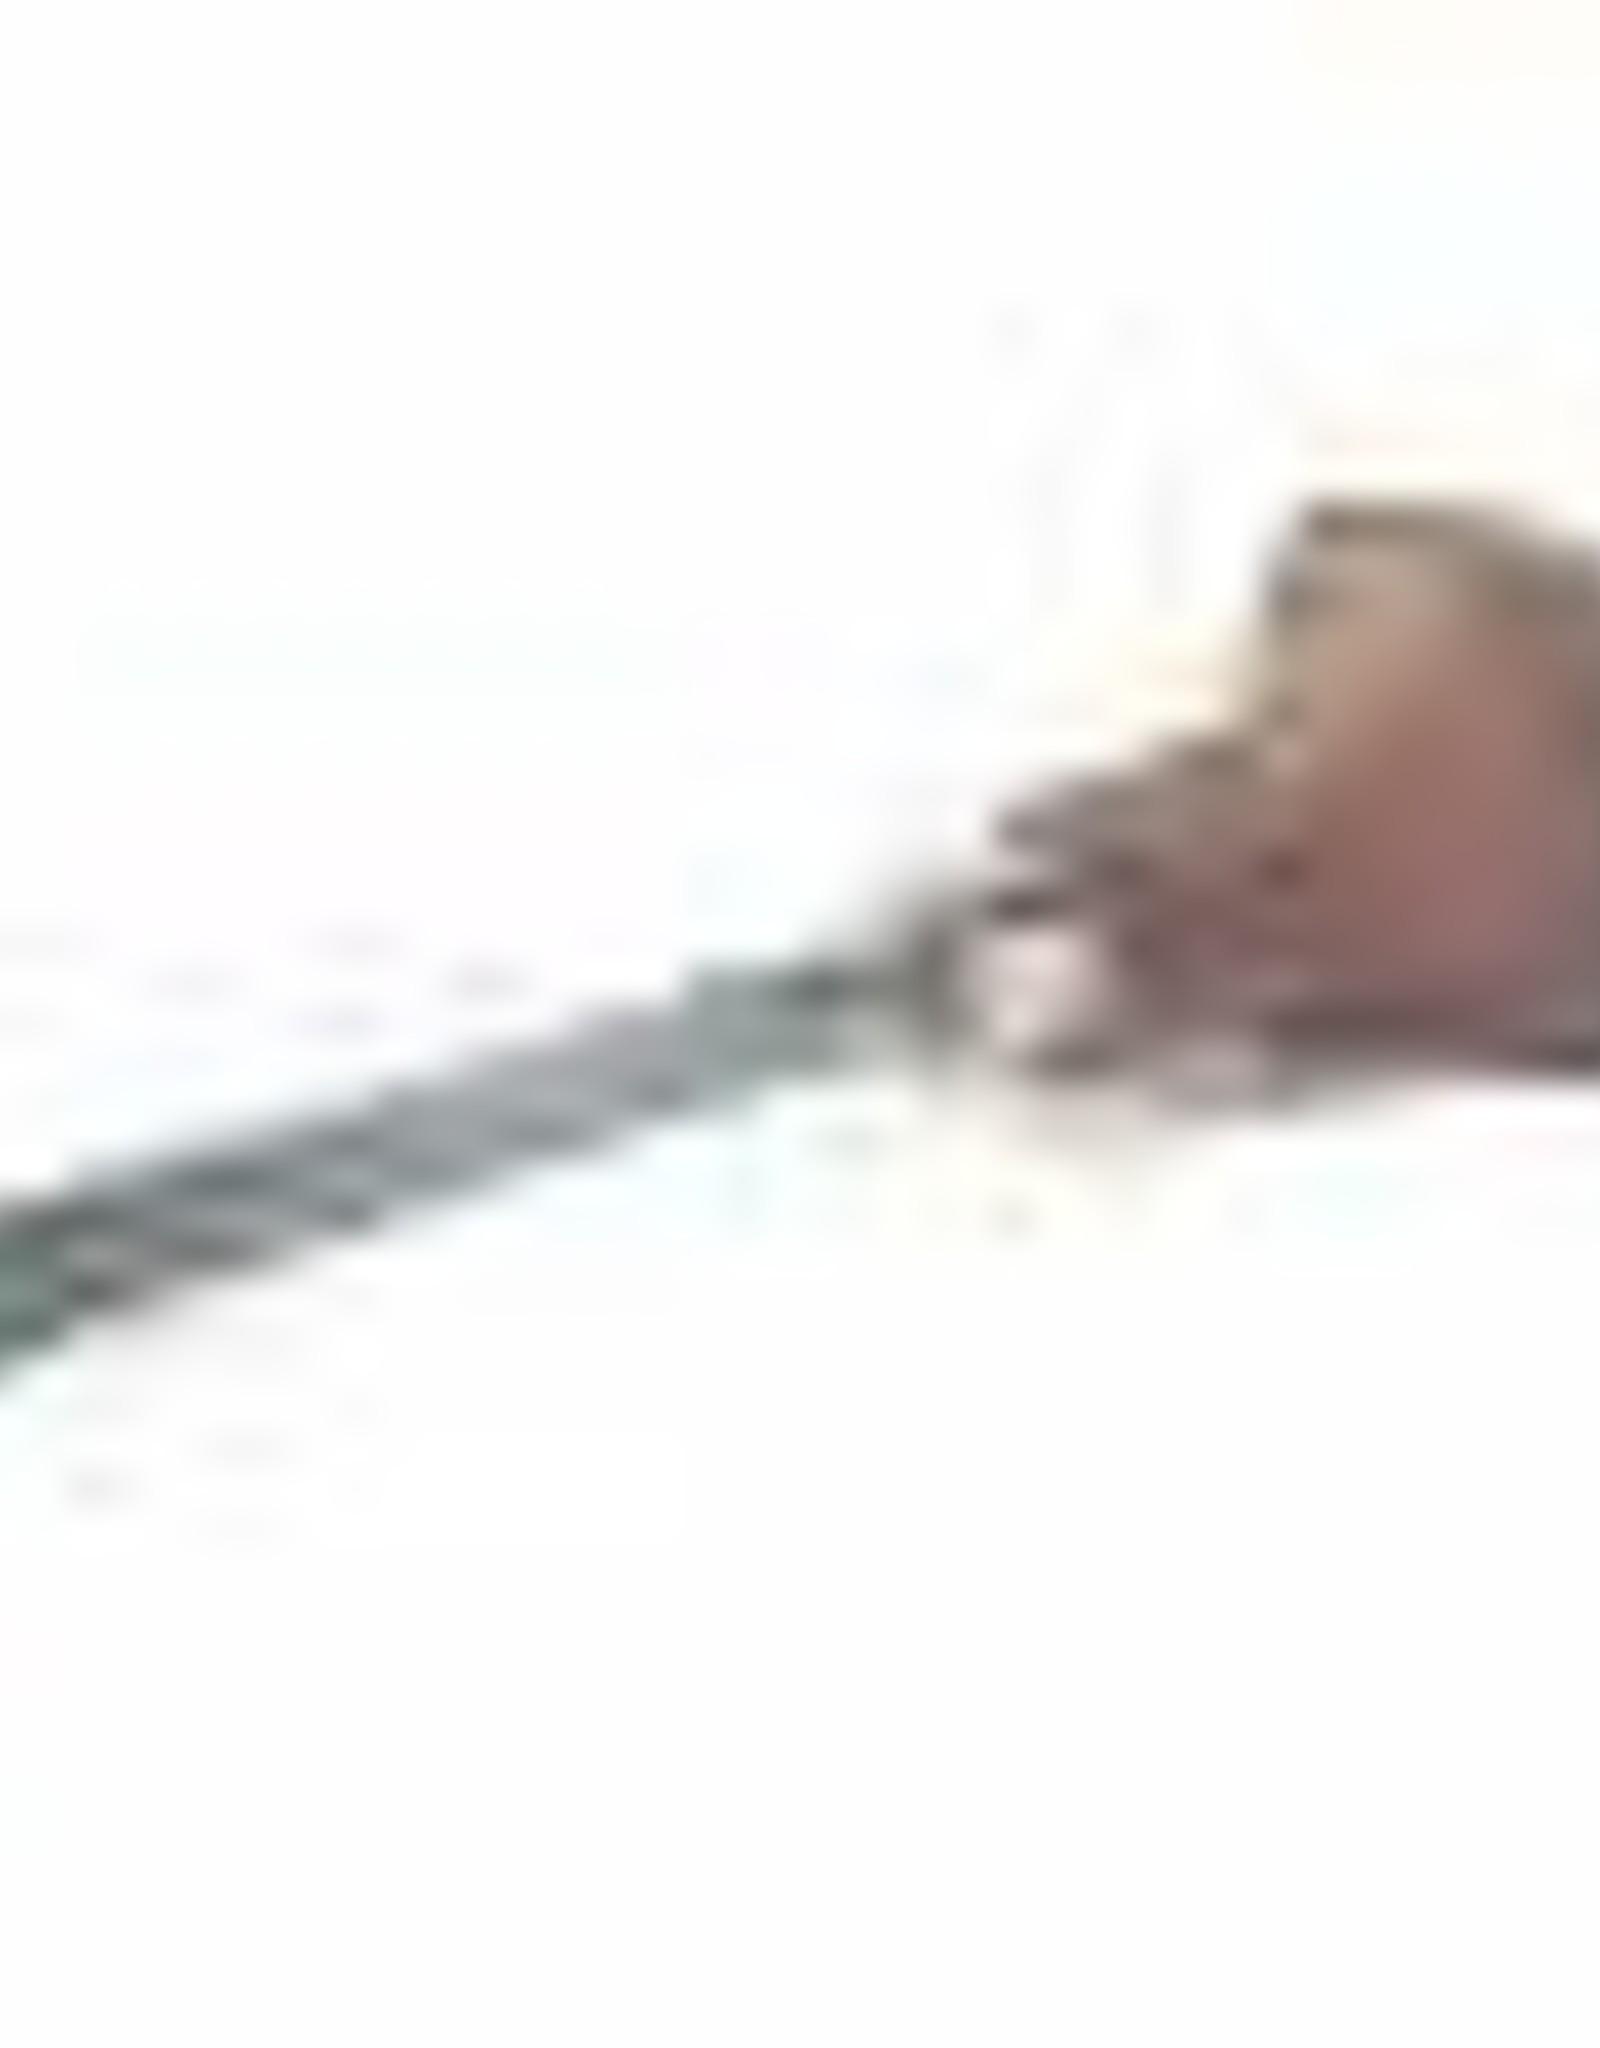 Pfeil houtsnij-/linoguts Pfeil handpalm serie 15-6mm breed (B15/6) zeer diepe v